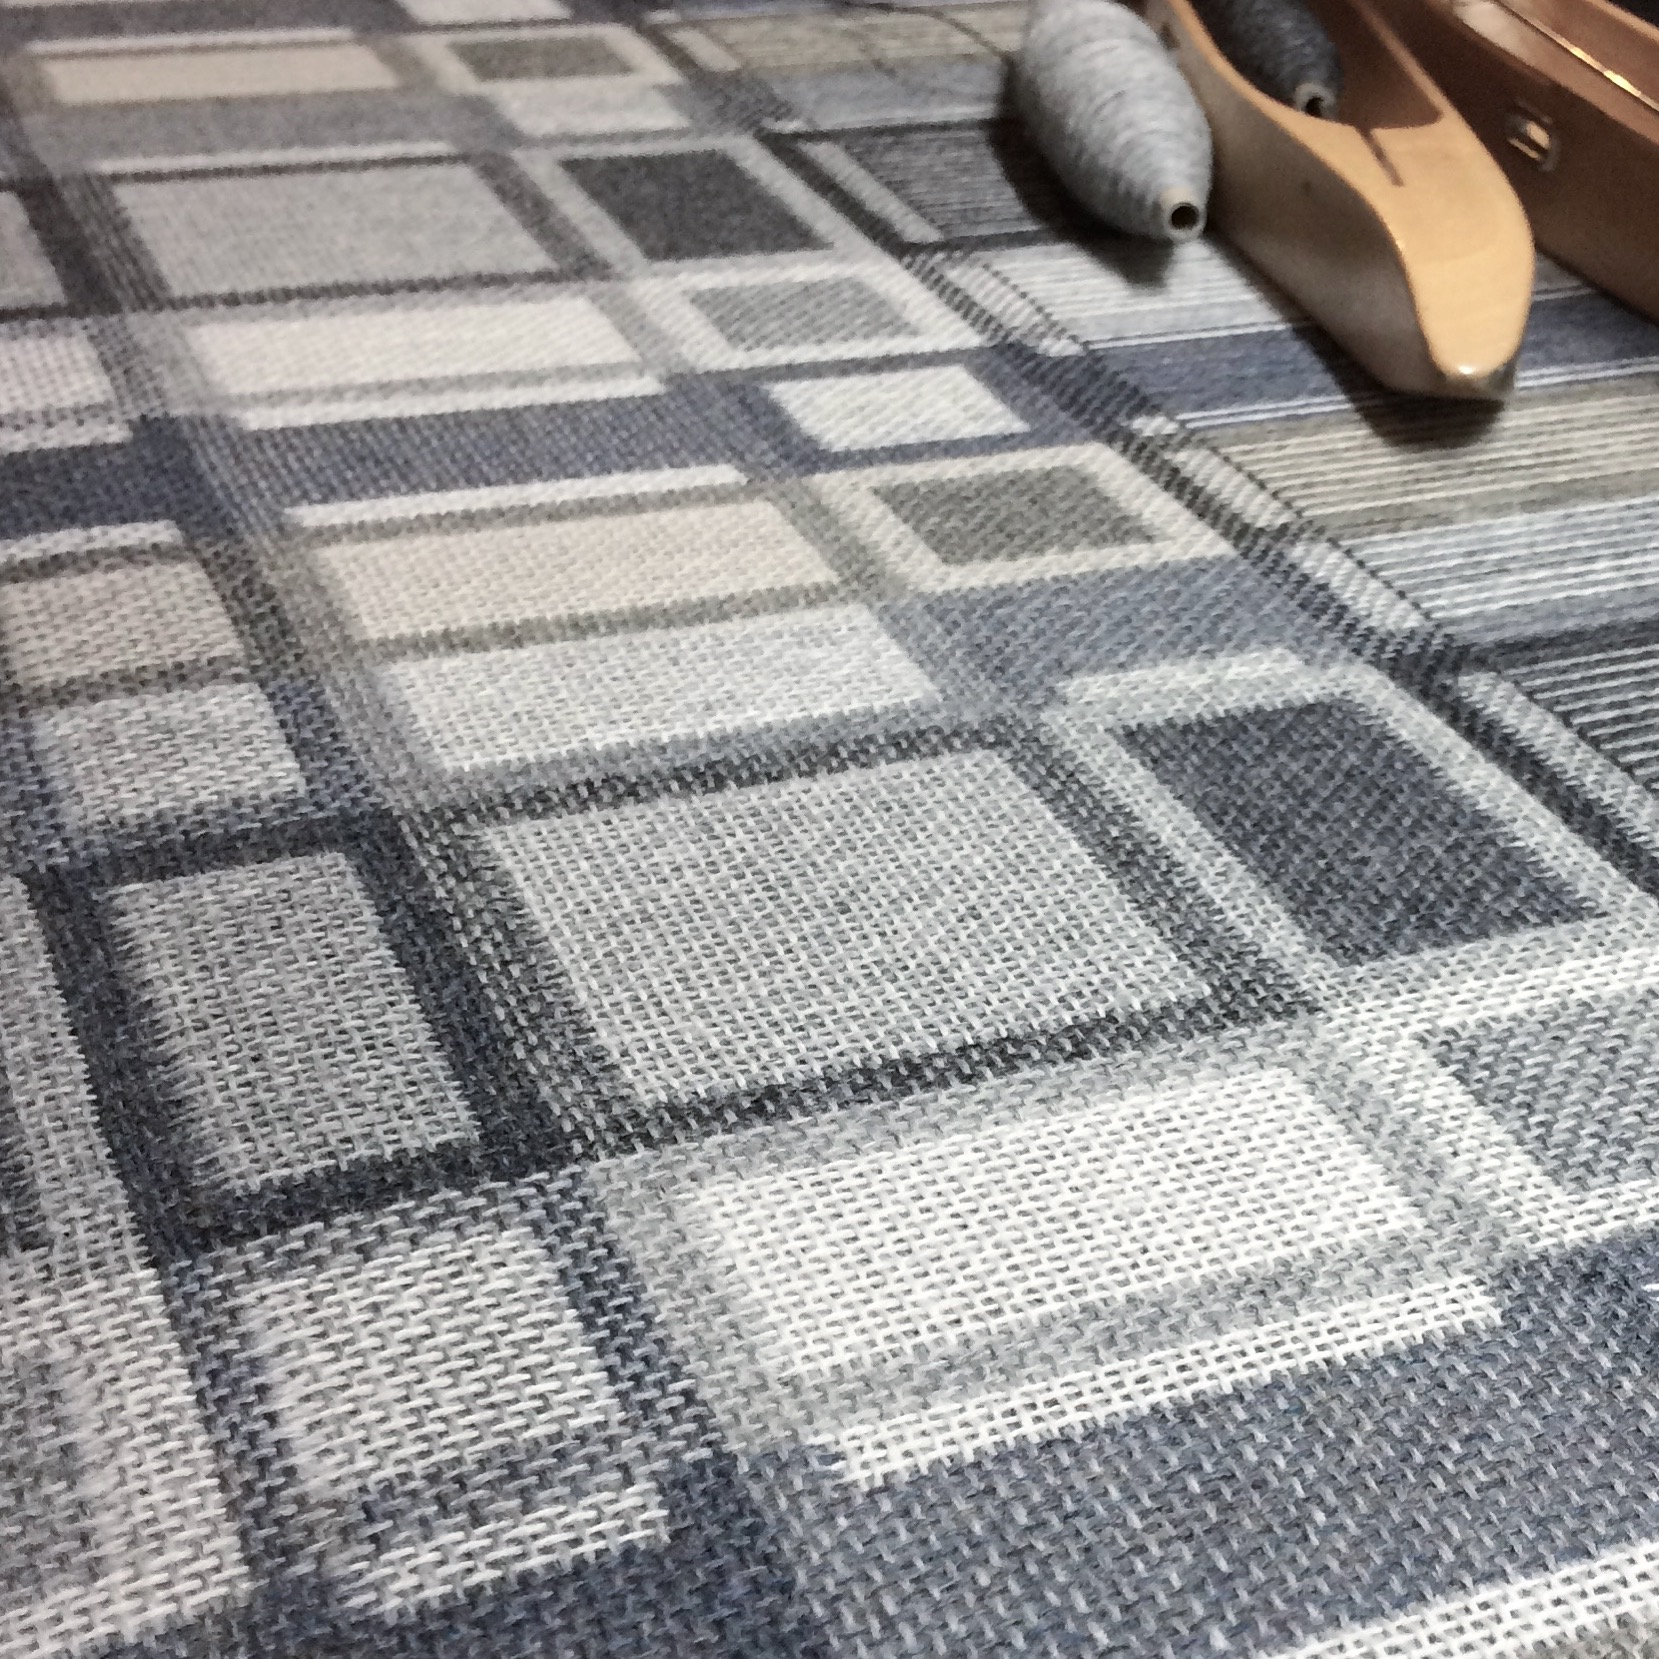 Neist fabric being woven, pebble